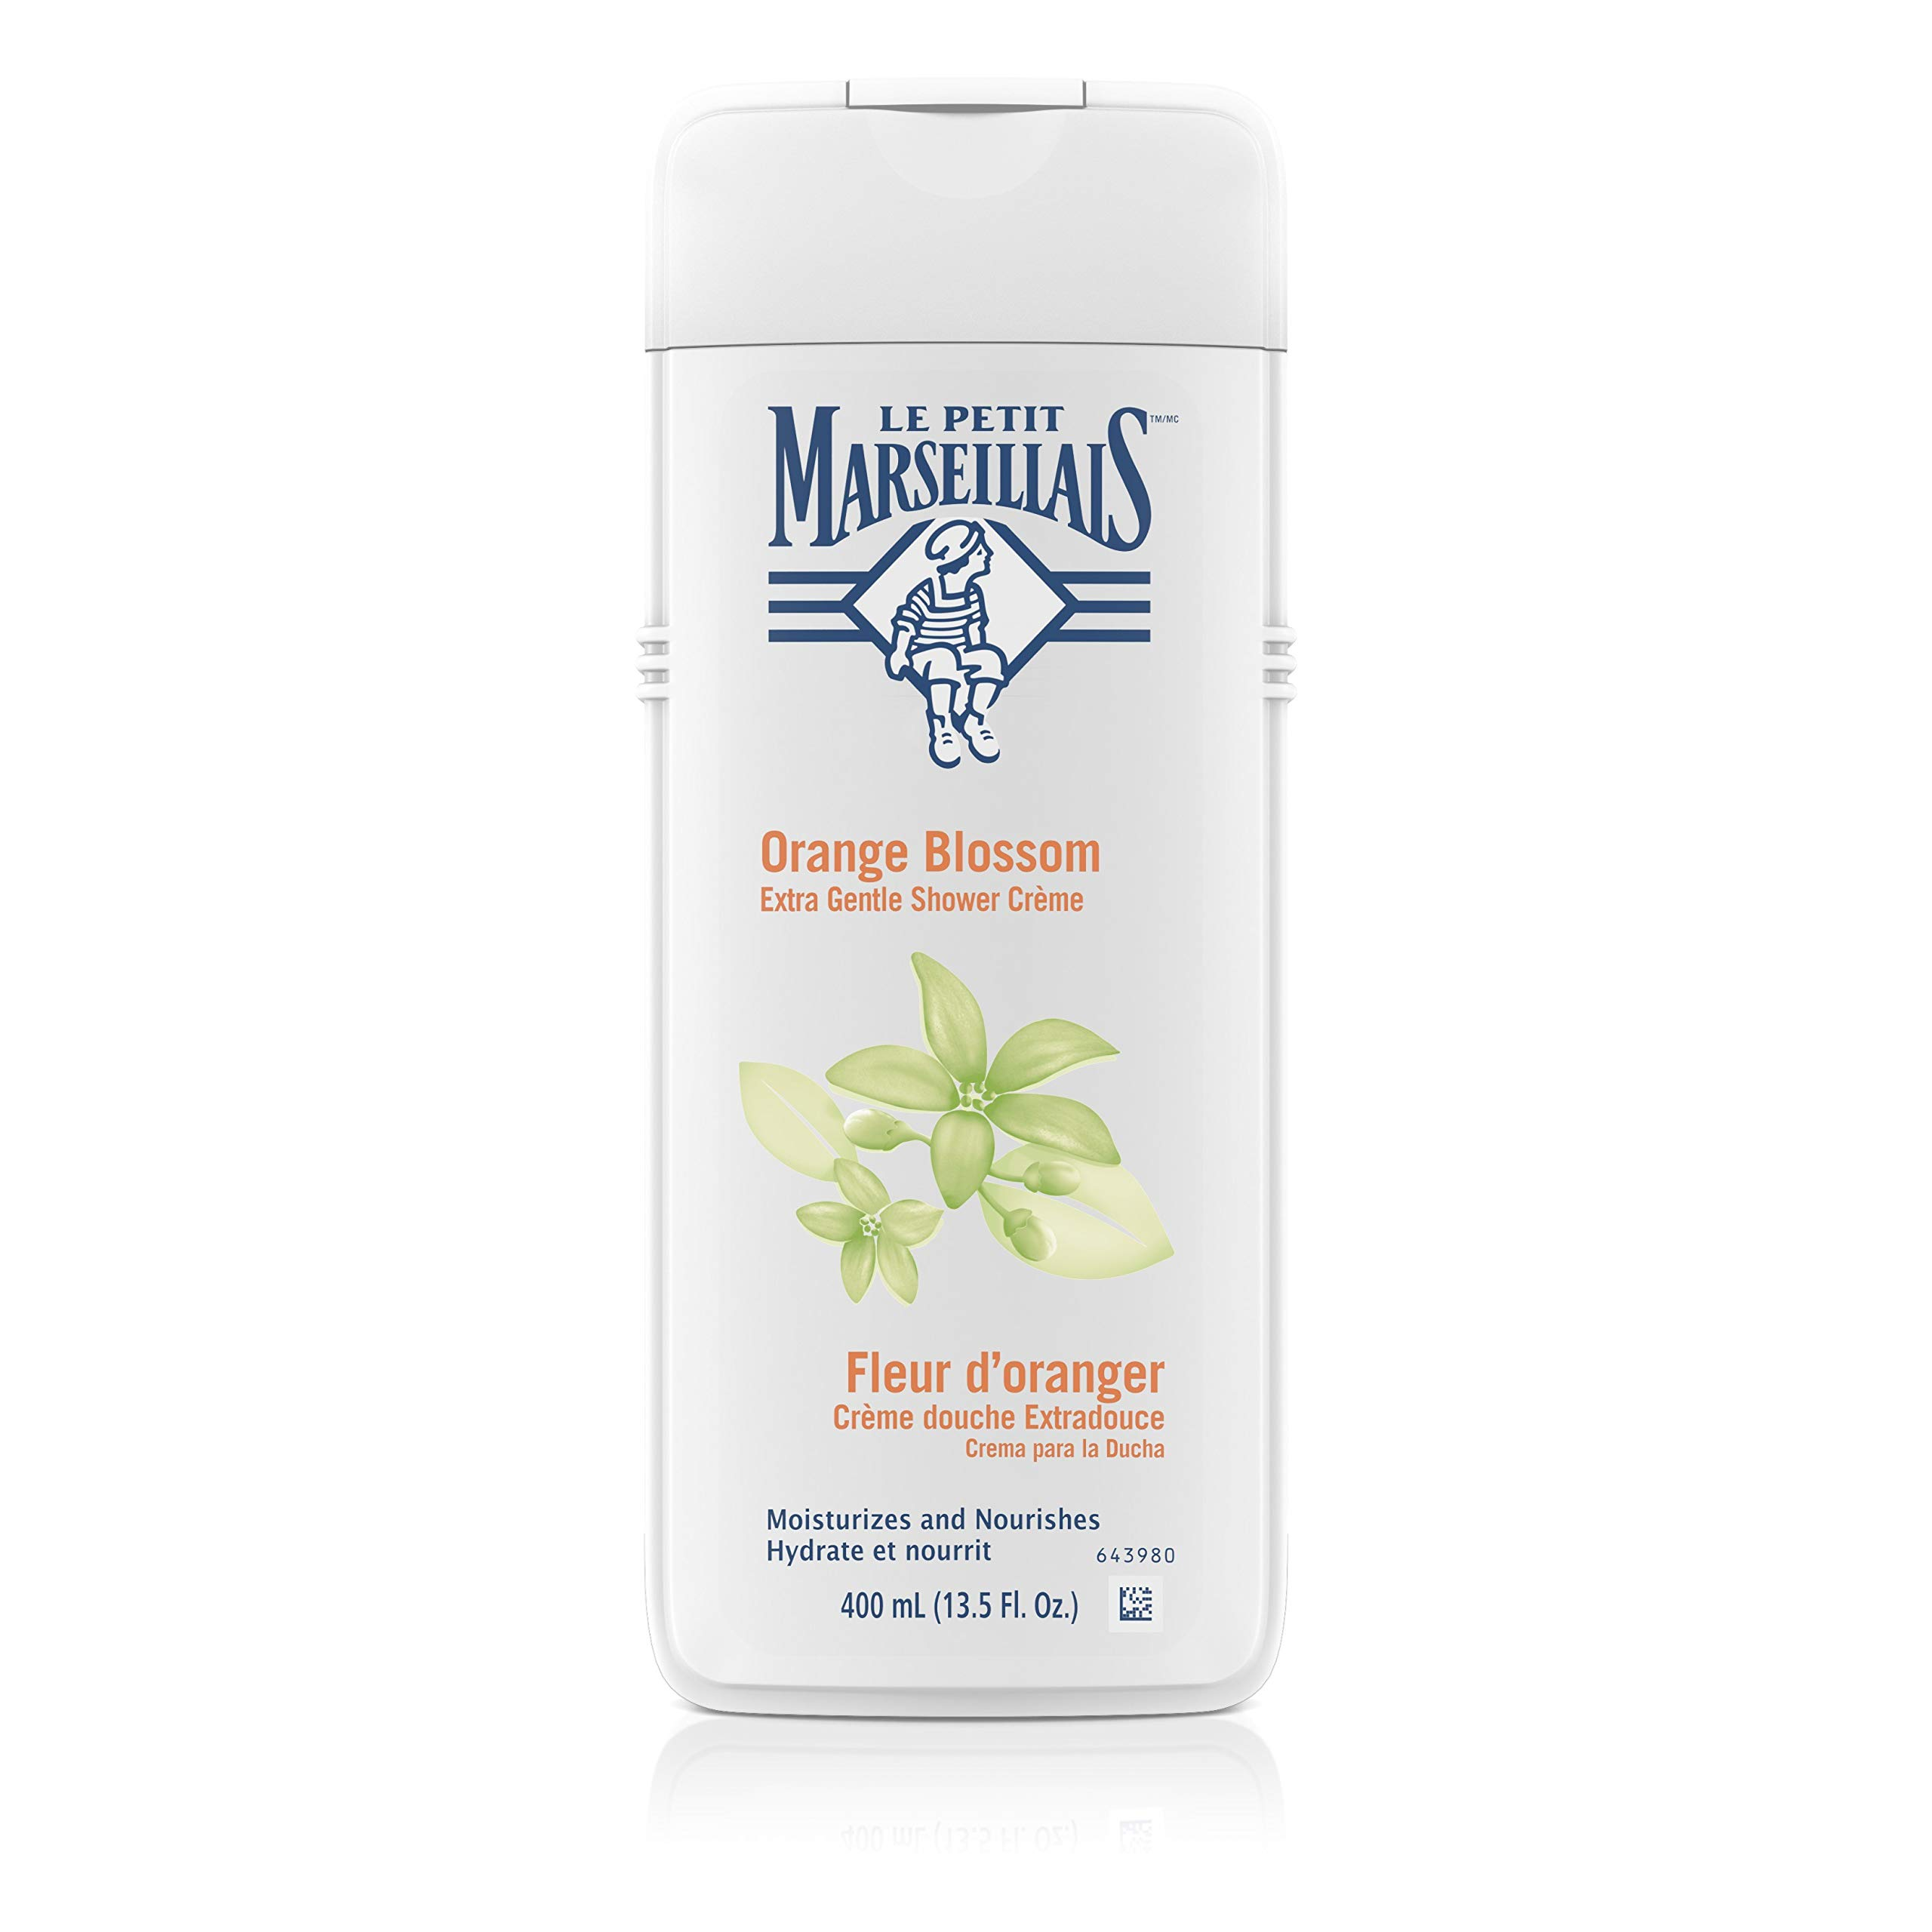 Le Petit Marseillais Extra Gentle Shower Crème with Orange Blossom, Moisturizing & Nourishing French Body Wash for pH Neutral for Skin, 13.5 fl. oz